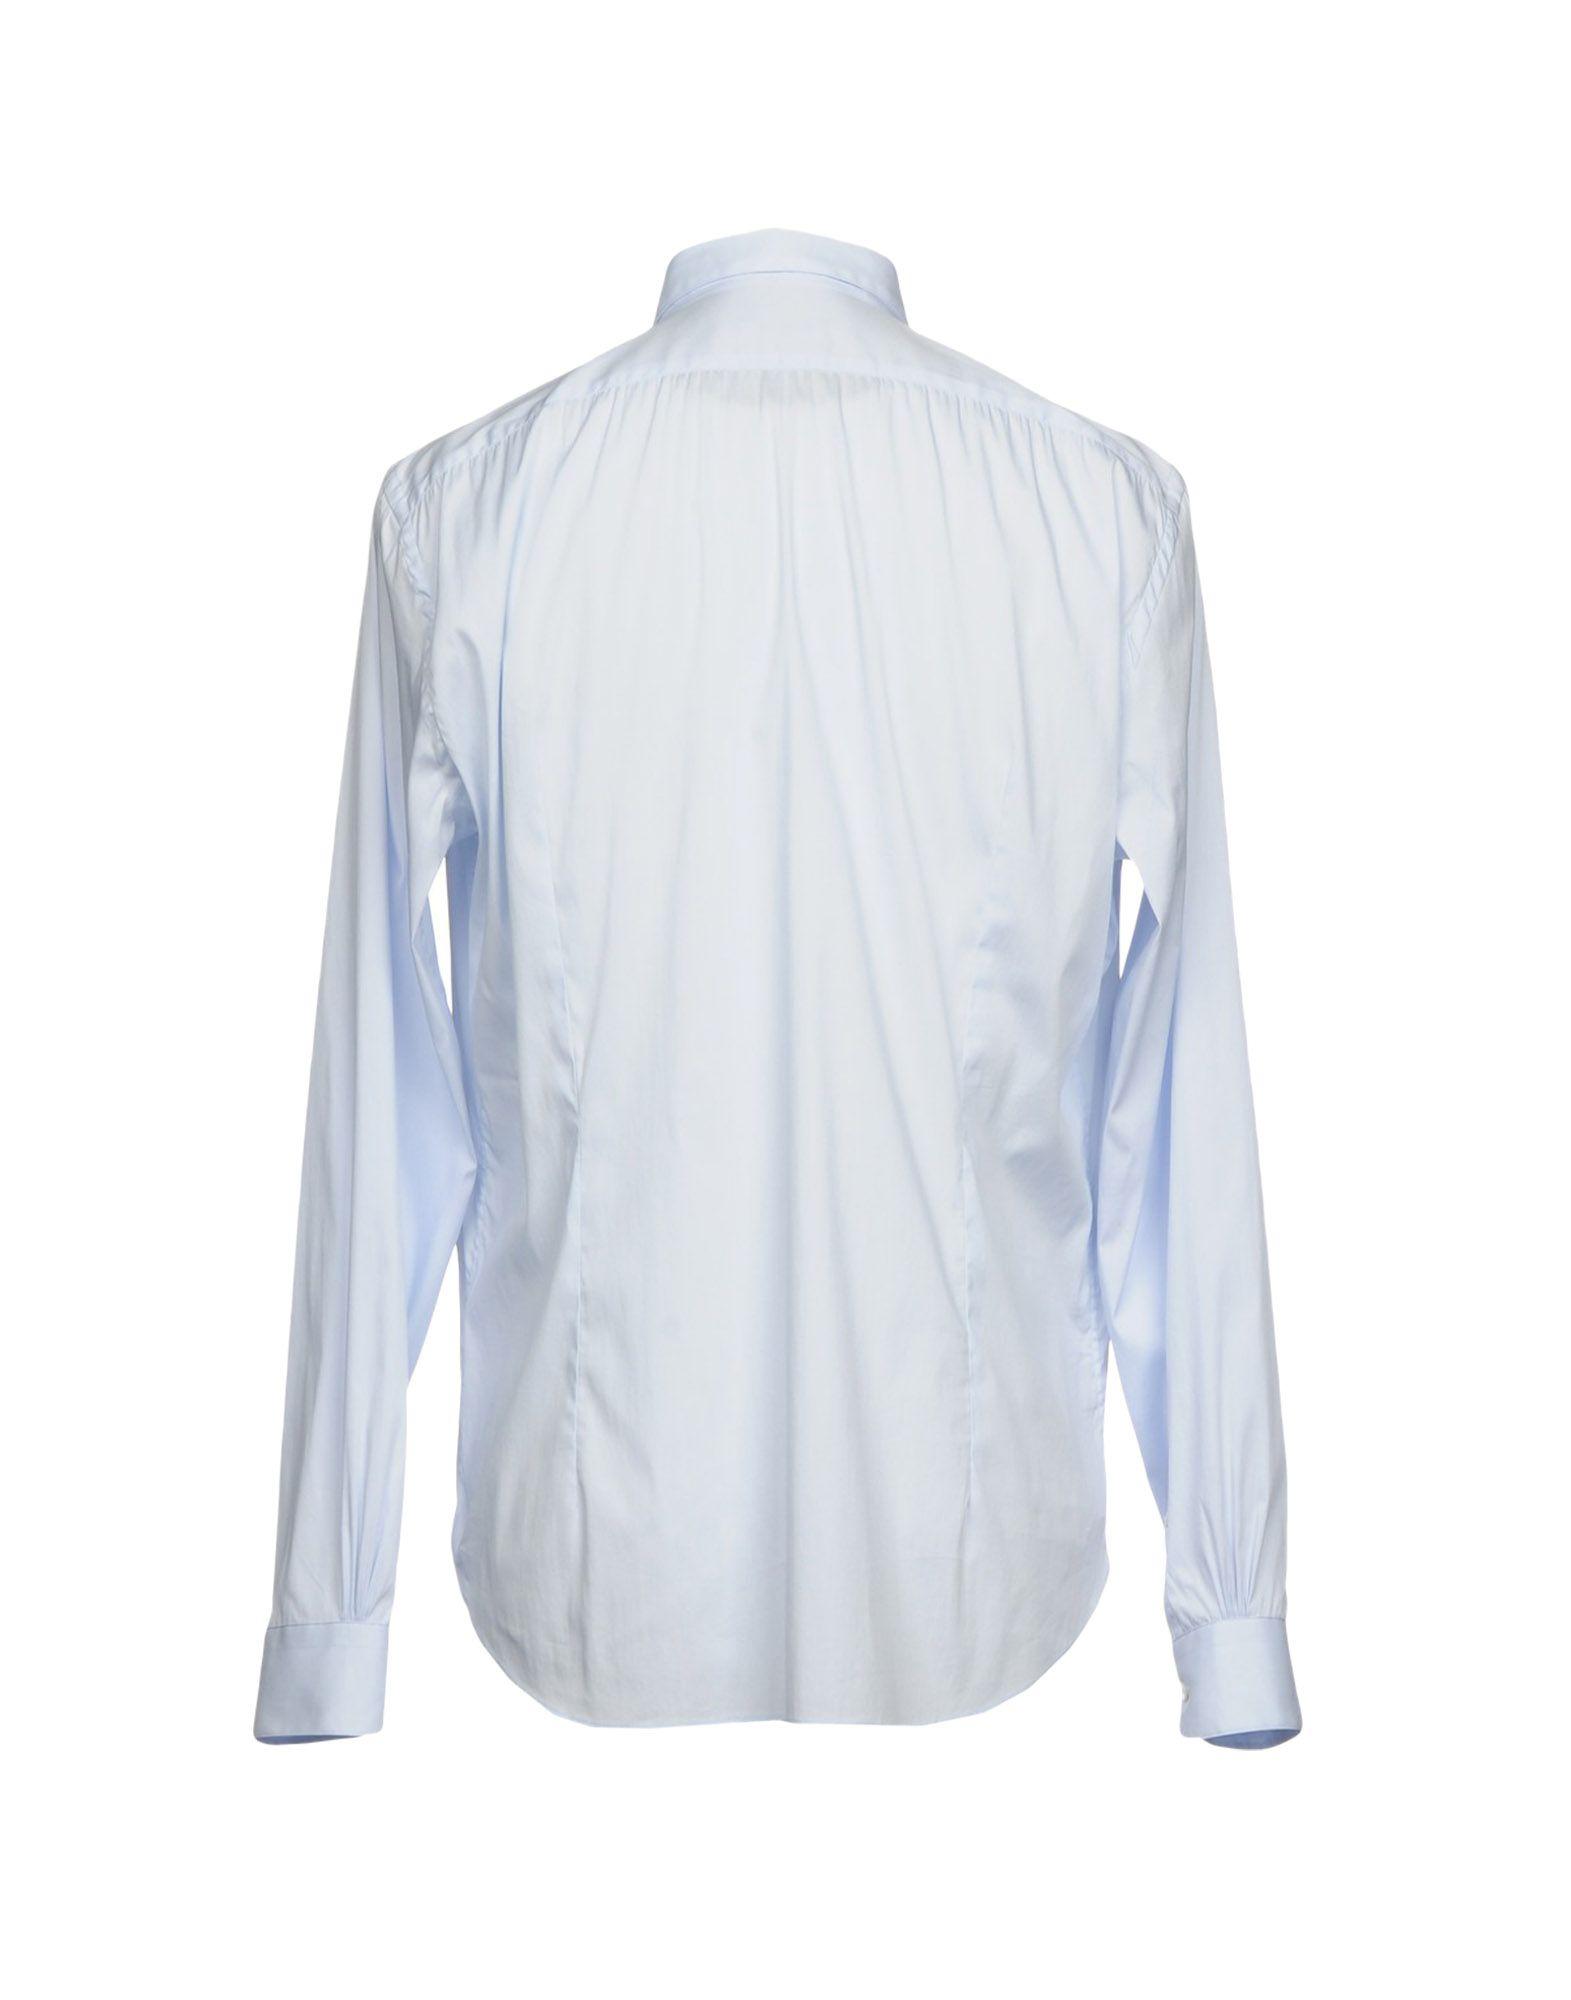 Camicia Tinta Unita Robert Friedman Friedman Friedman Uomo - 38691807KP ae5371